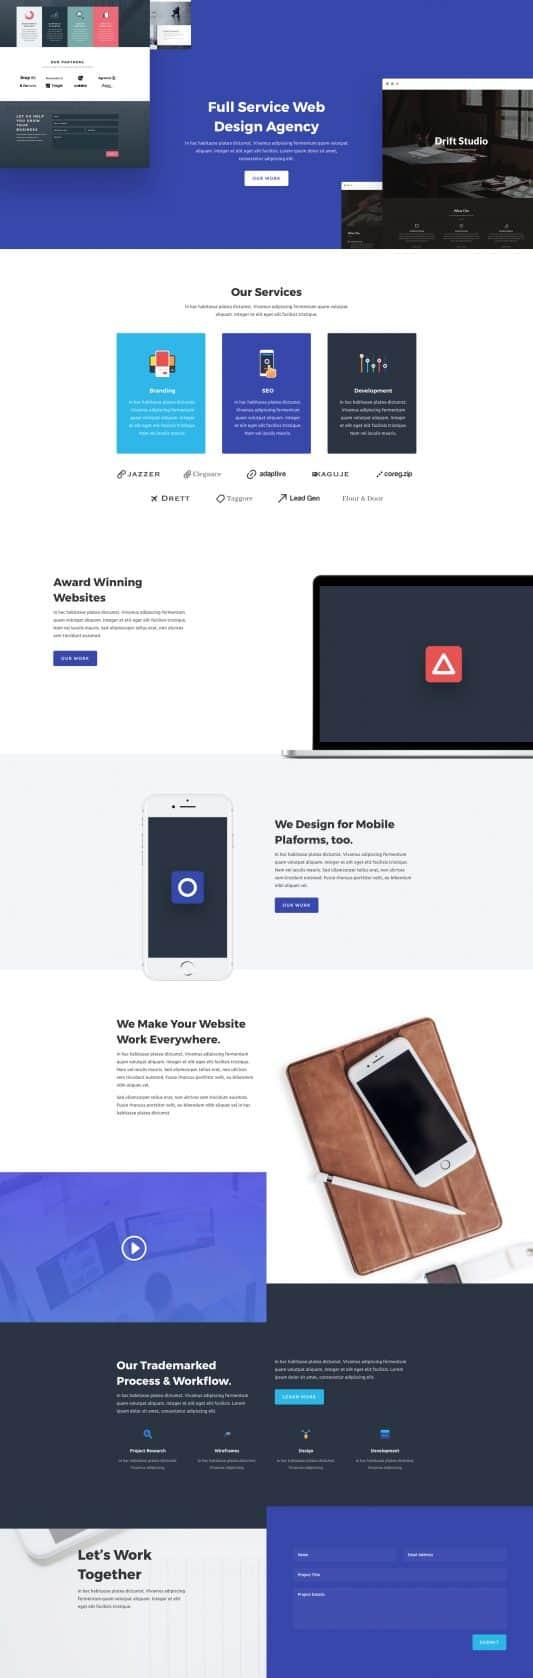 Web Agency Web Design 4